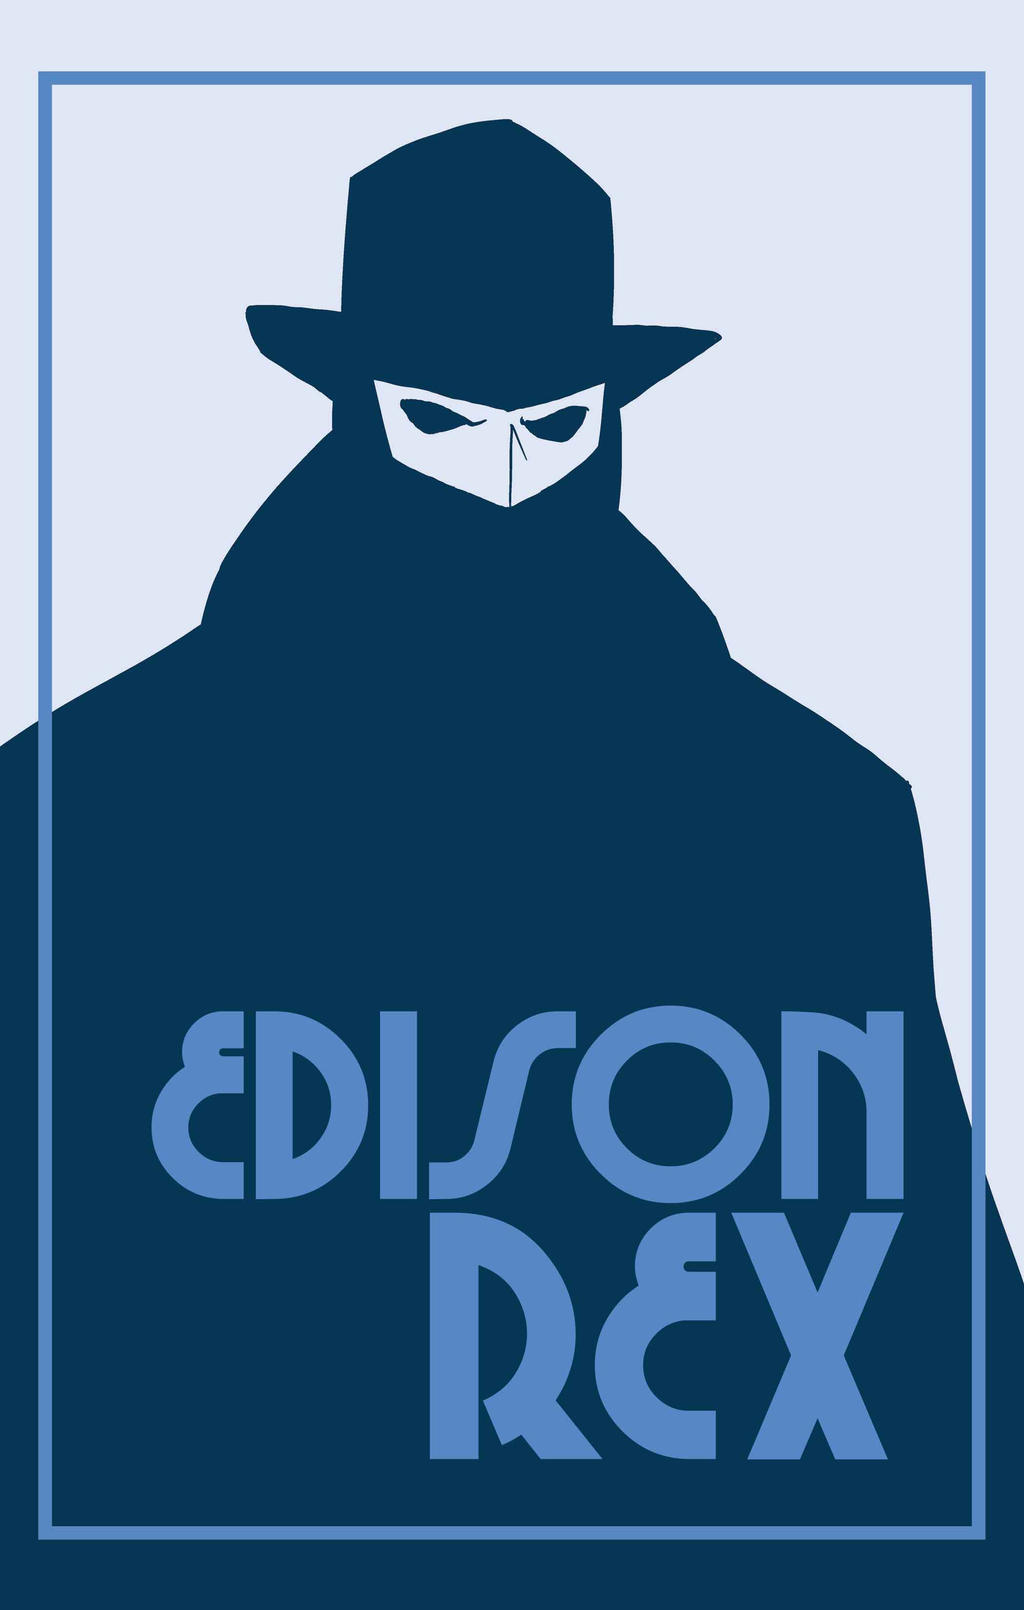 Edison Rex 11 cover by dennisculver